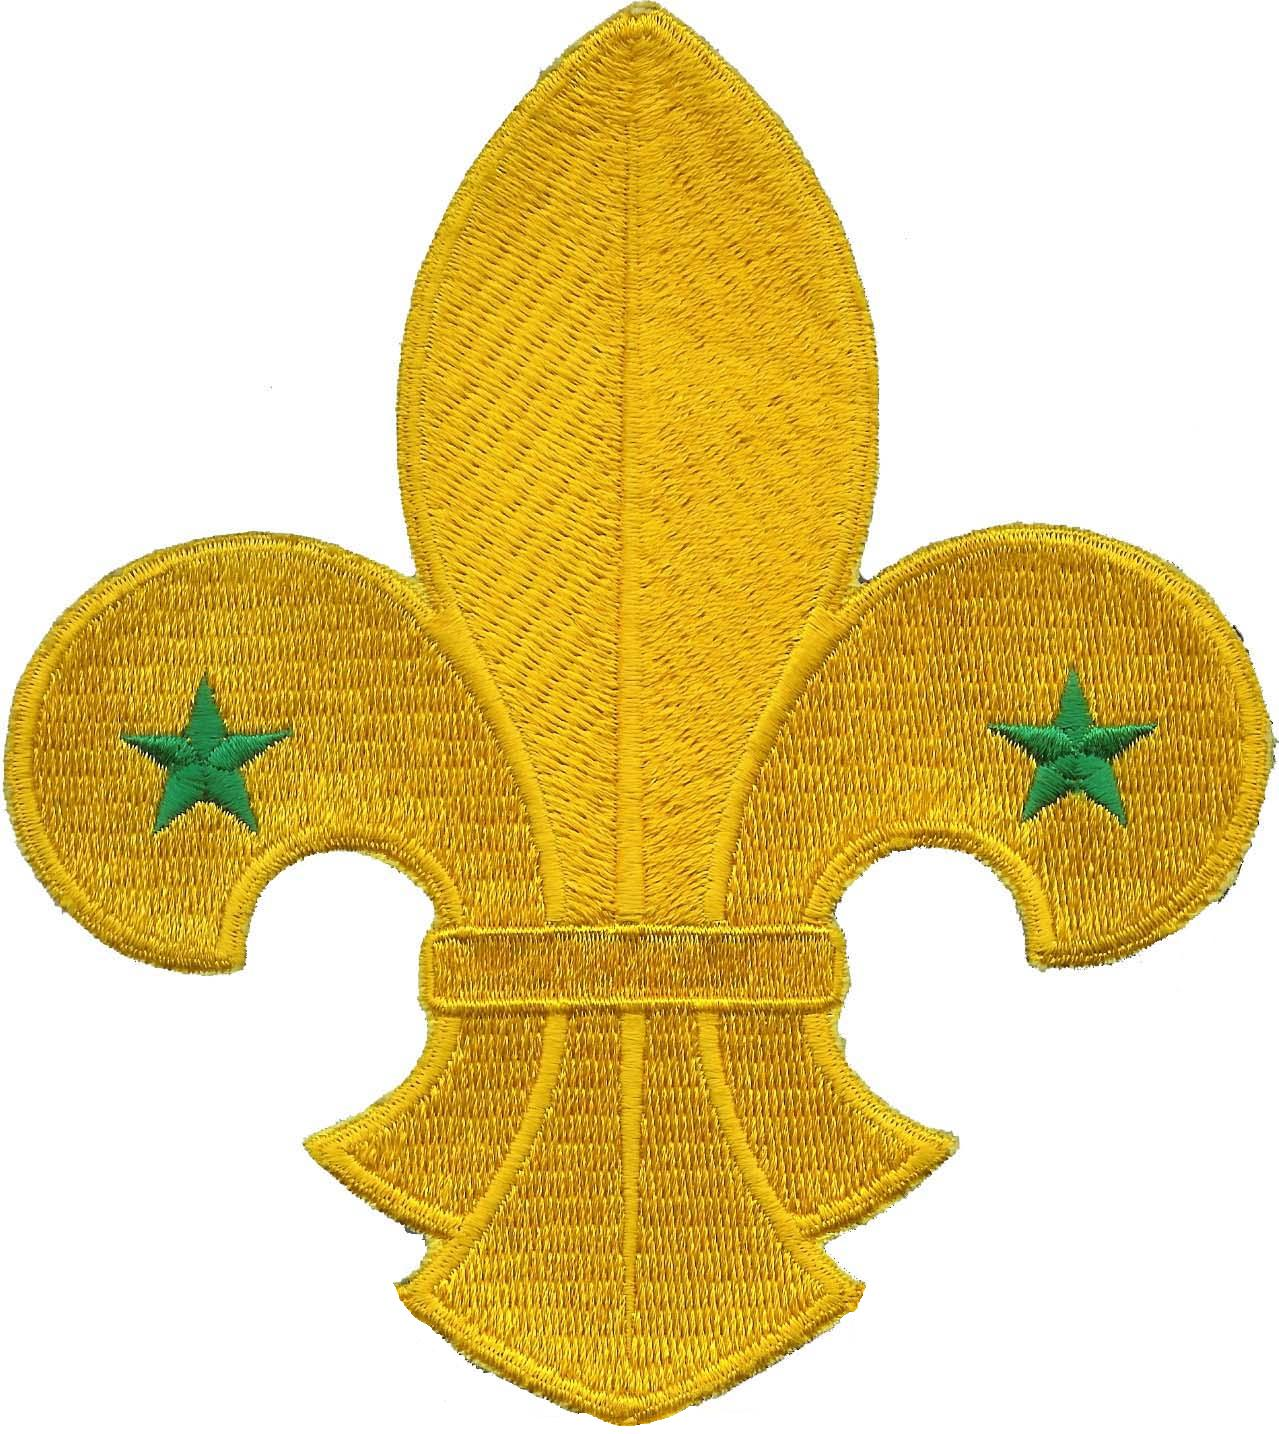 Filewikiproject Scouting Fleur De Lis No Scrolljpg Wikipedia